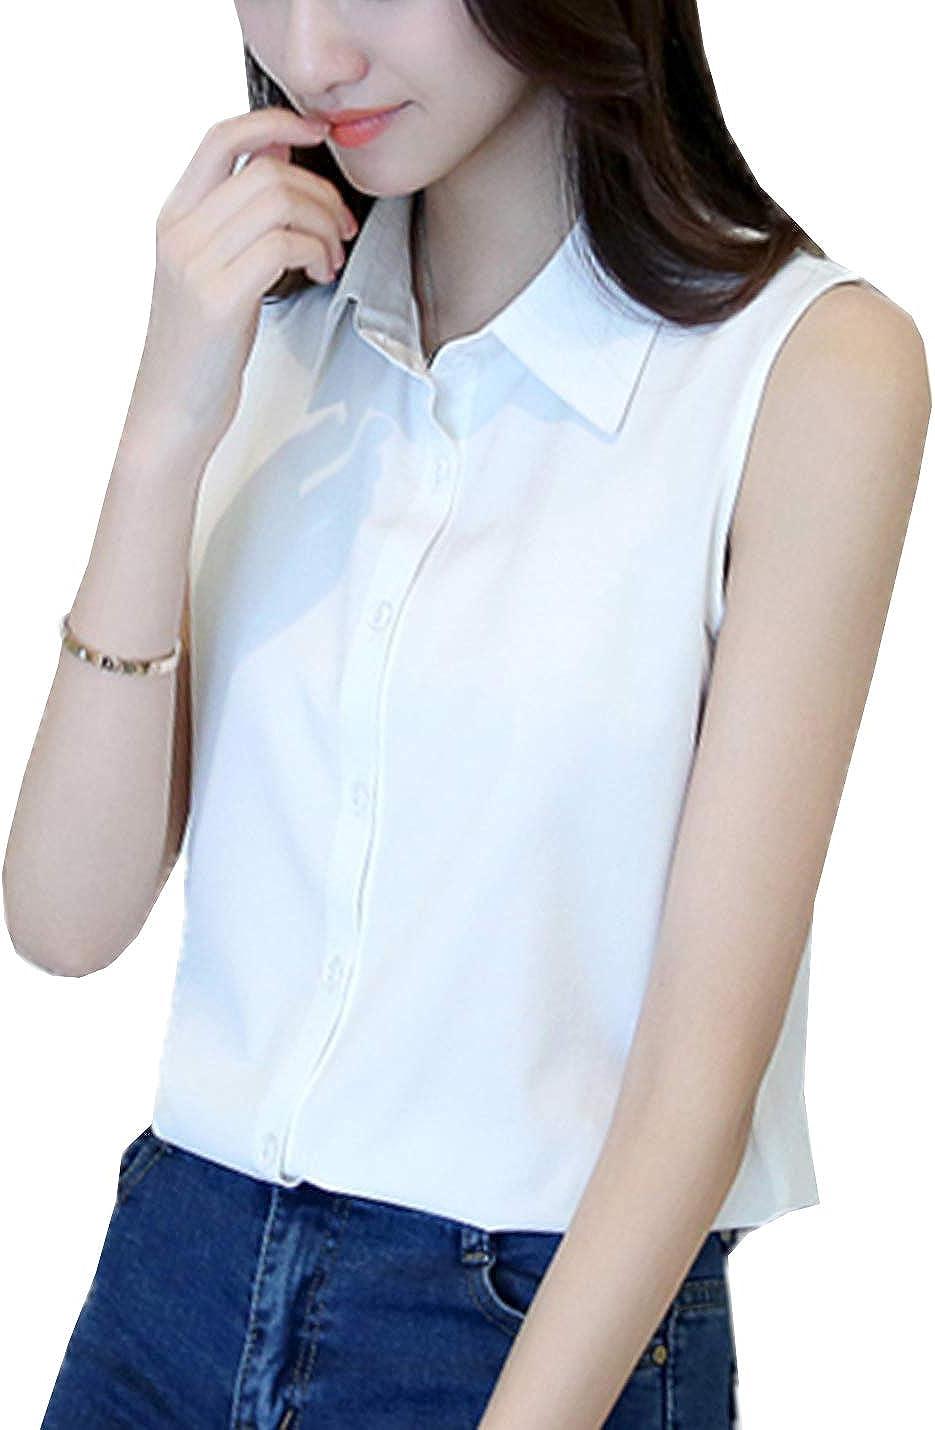 PAODIKUAI Women's Collared Sleeveless Tops Chiffon Casual Blouse Shirts Tank Tops